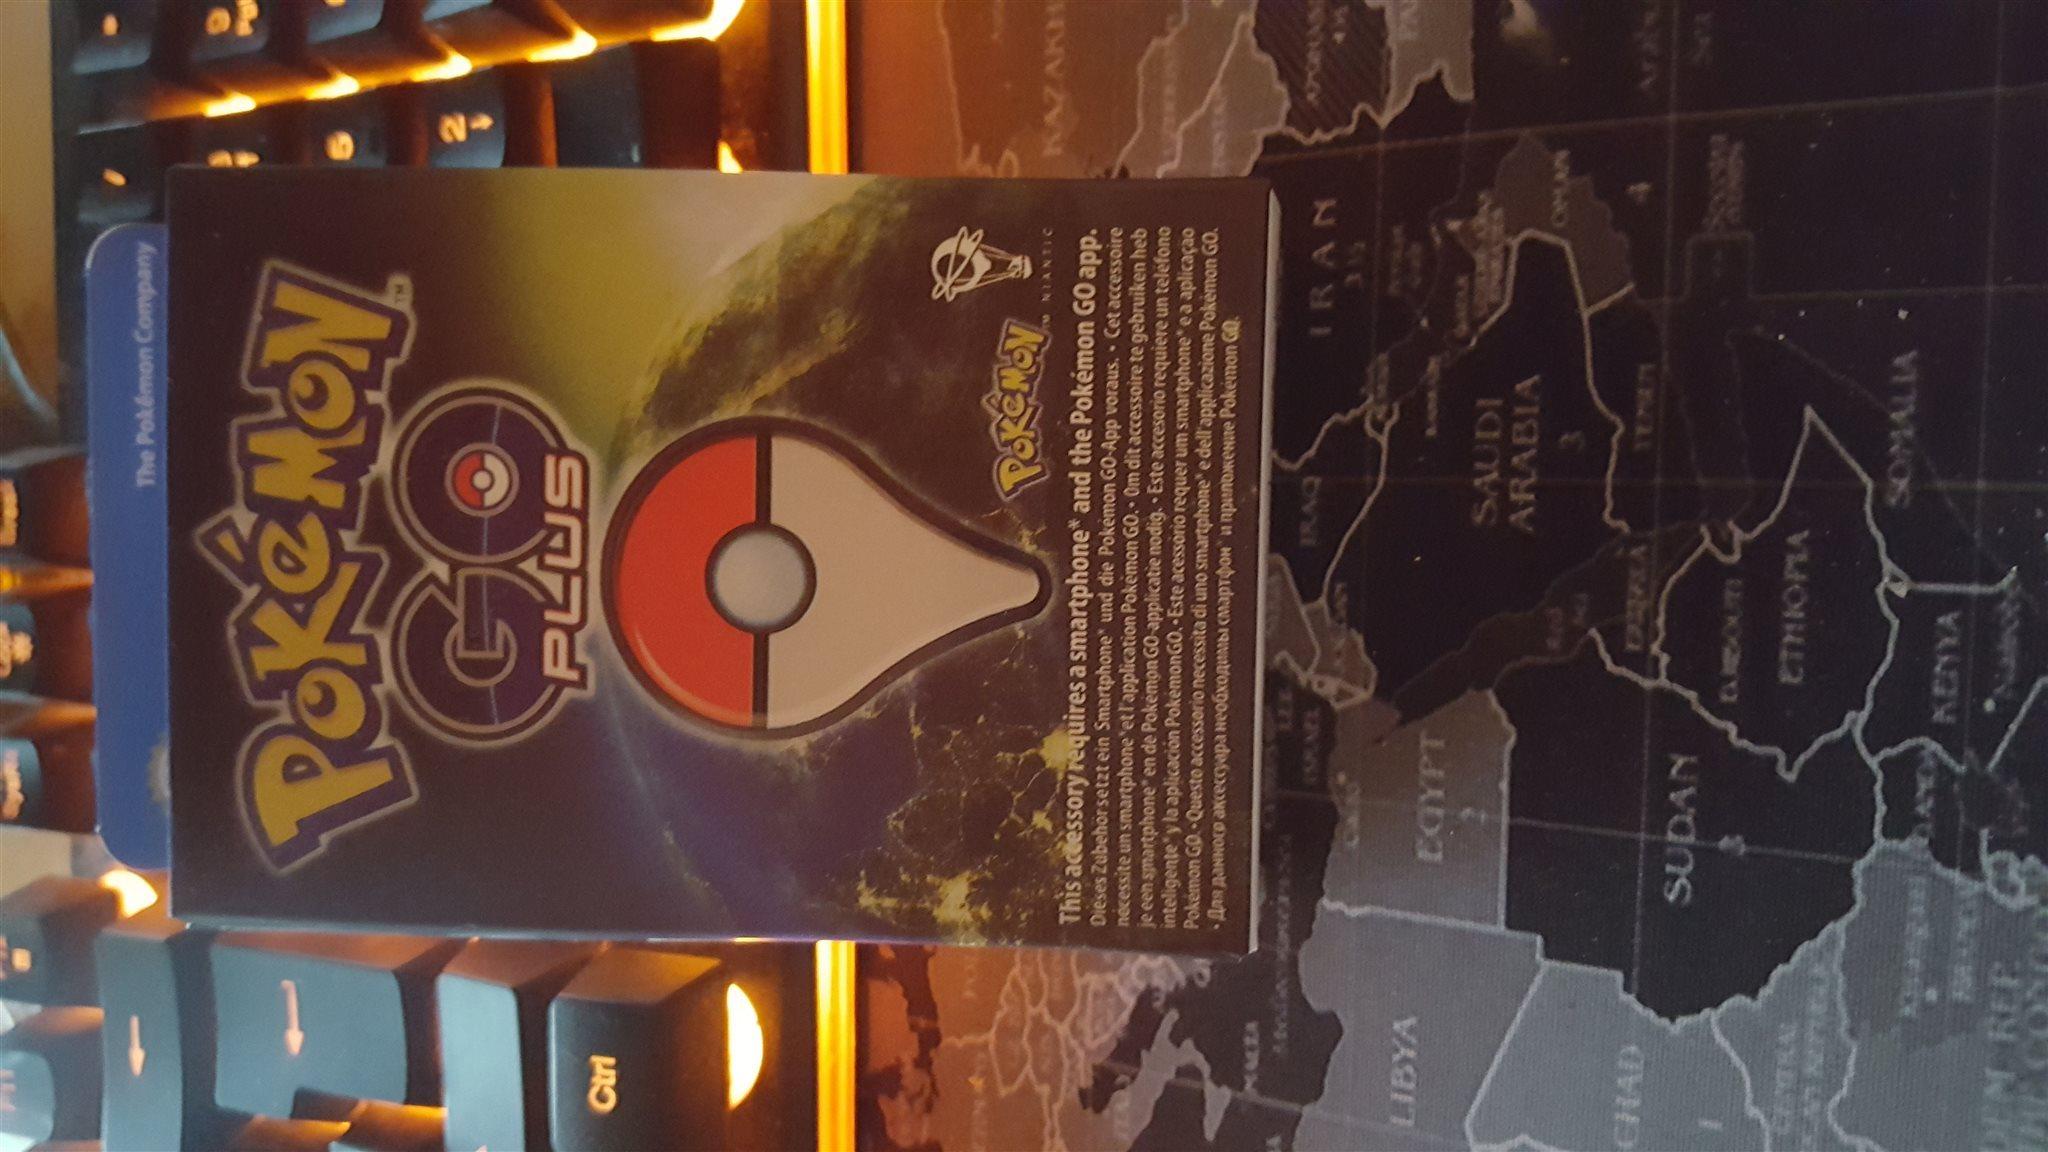 App Di Design ny pokemon go plus (337064467) ᐈ köp på tradera